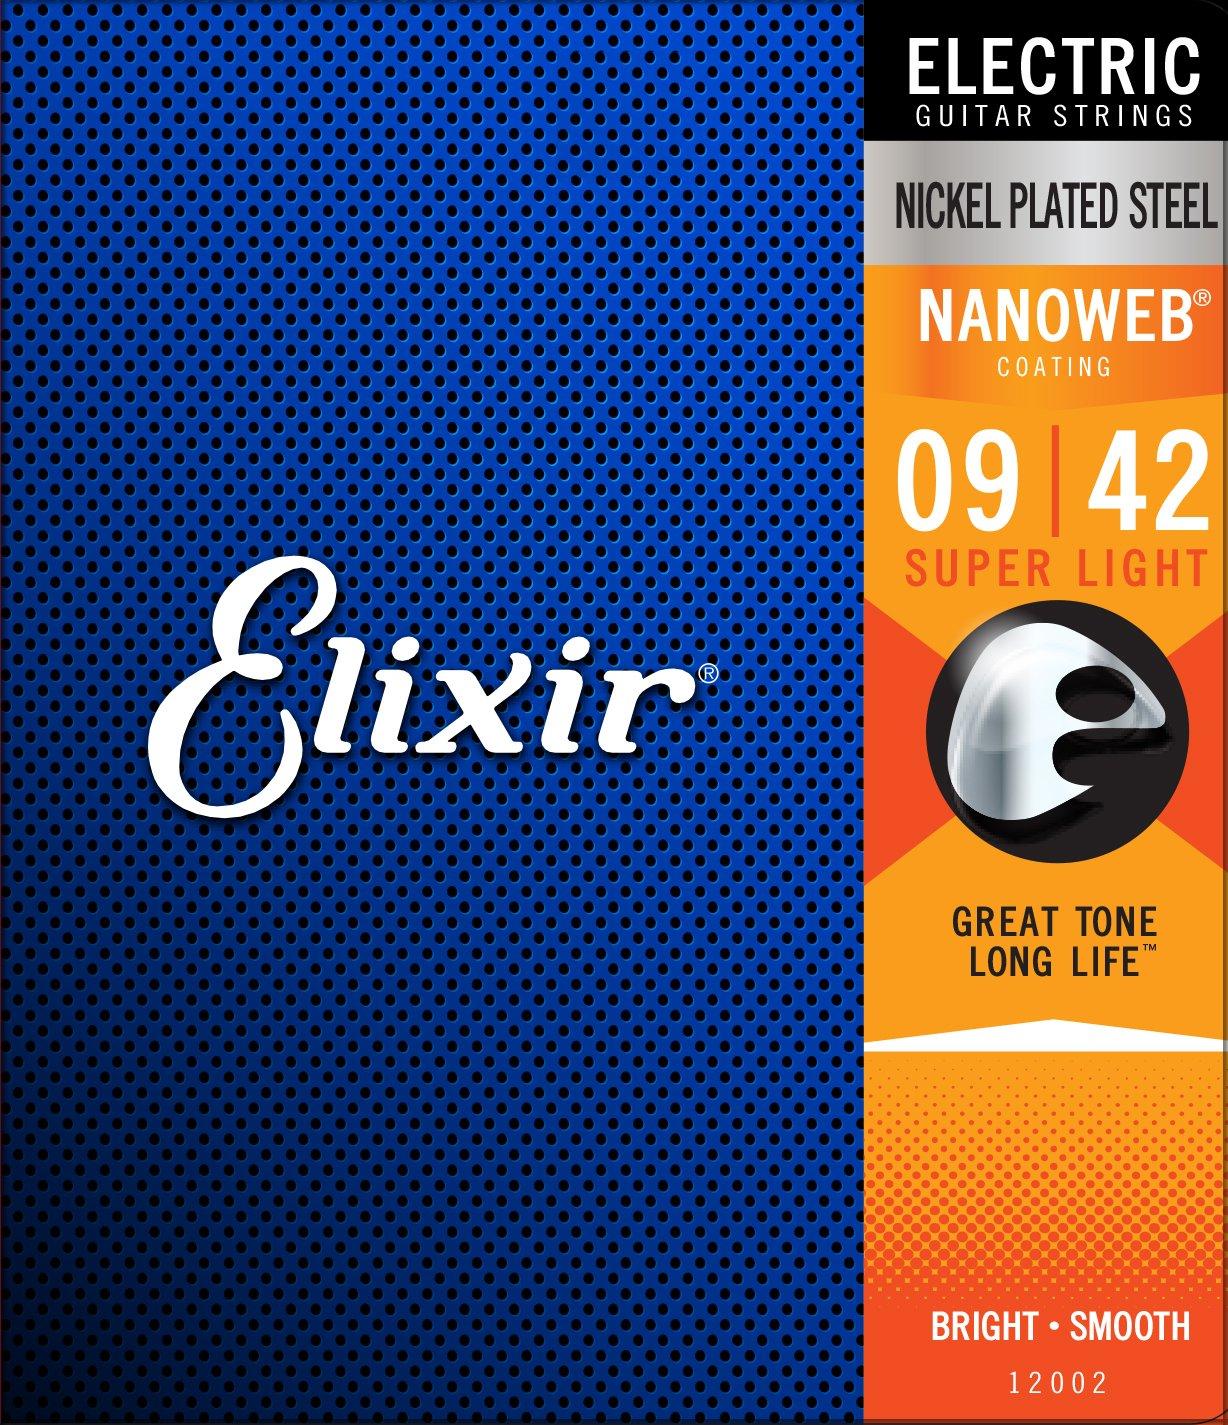 Elixir 12002 Nanoweb Electric Guitar Strings, Super Light, 09-42